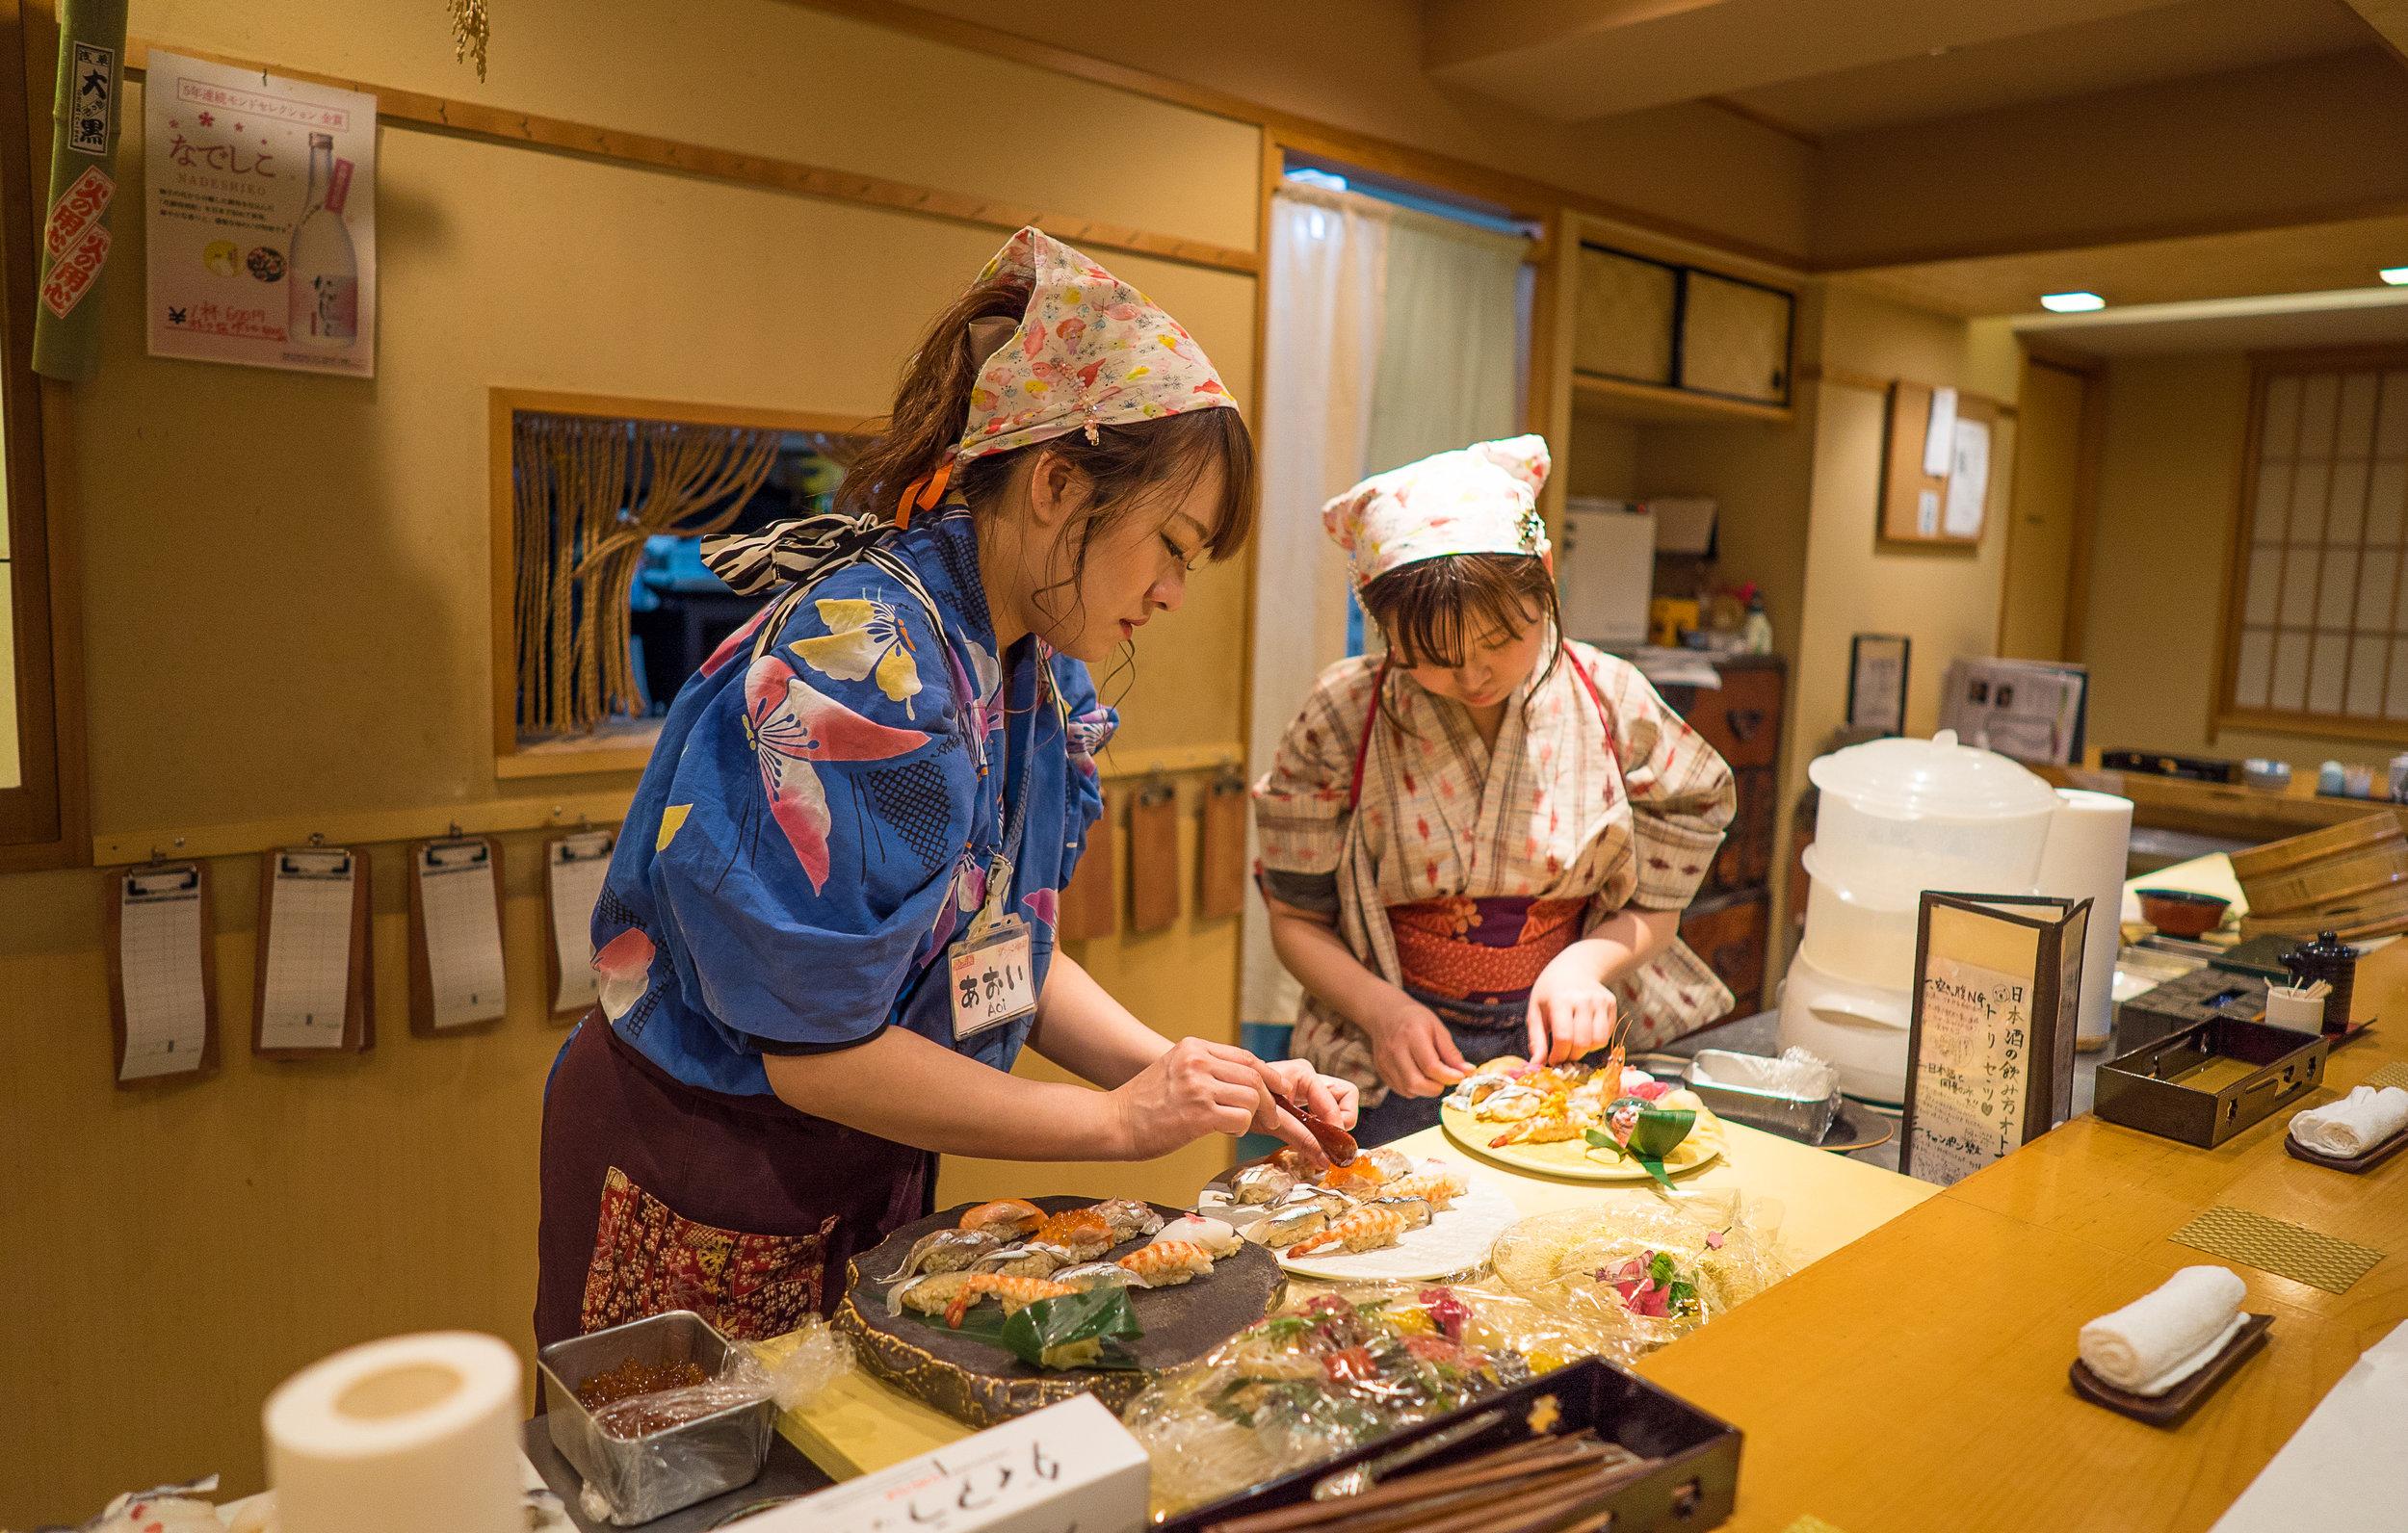 Yuki and a fellow sushi chef plate dishes to serve at Nadeshiko Sushi. (Courtesy of Amarachi Nwosu / Malala Fund)